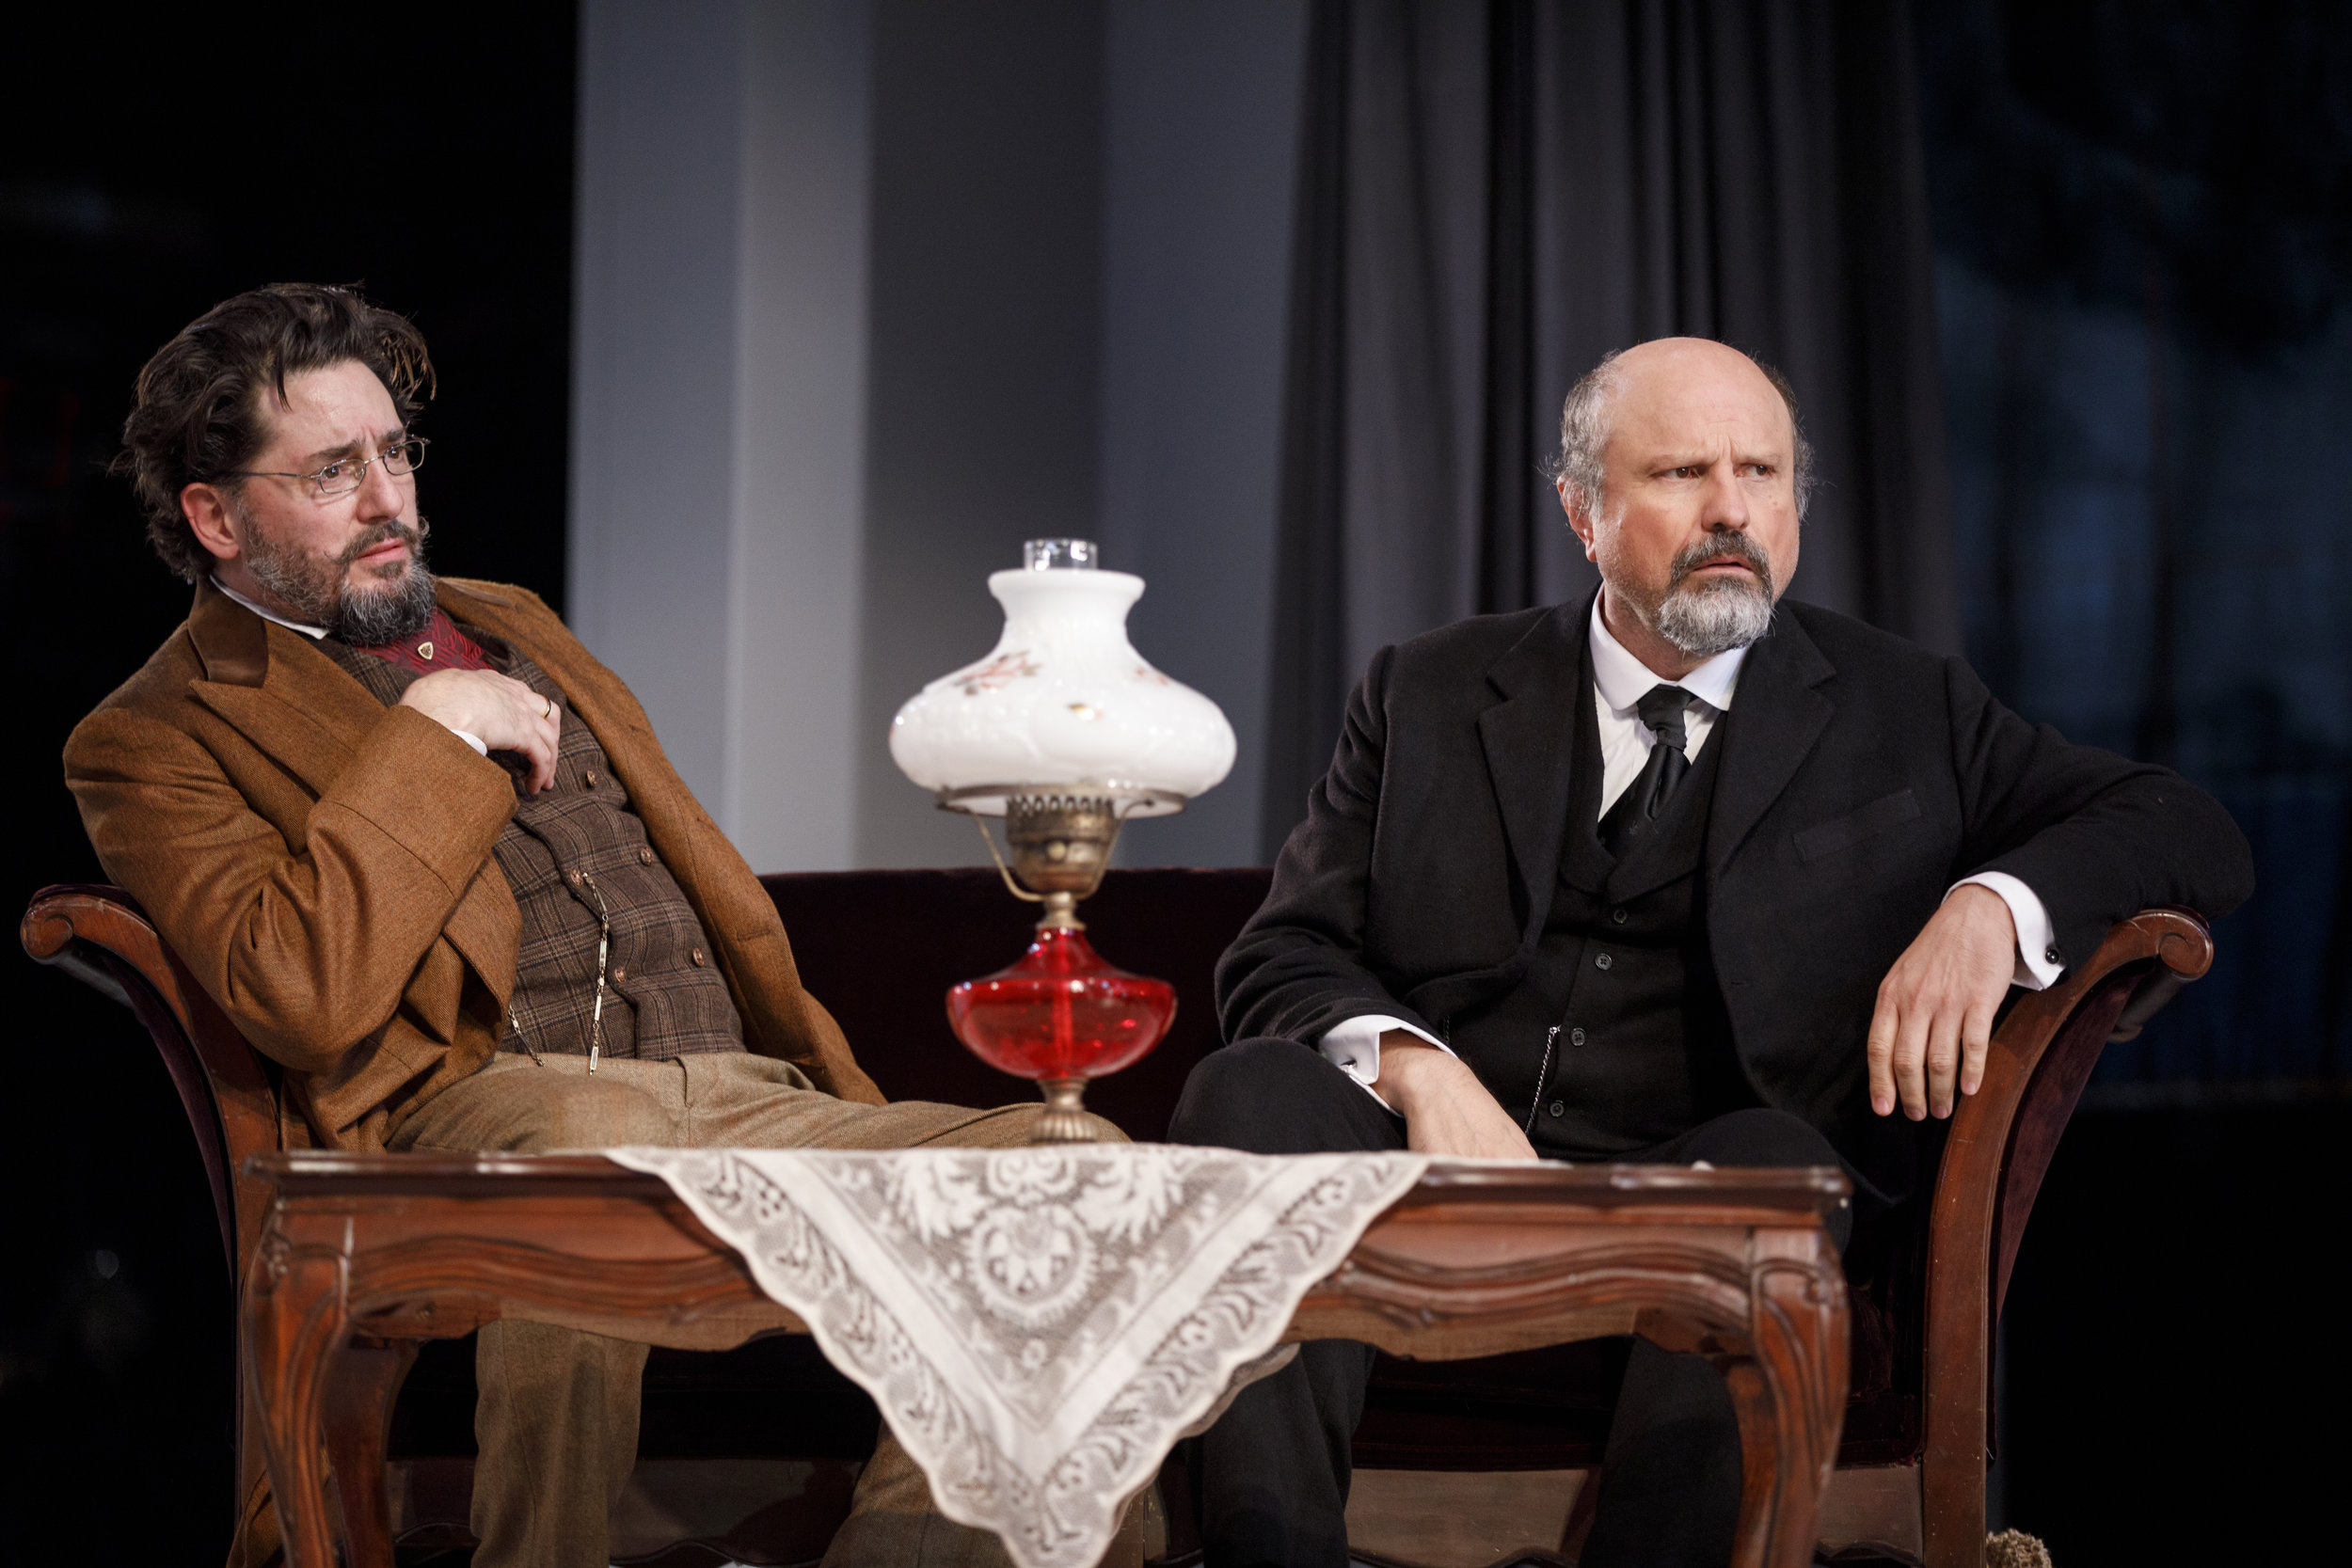 Dr. Thomas Stockmann (Reg Rogers), Mayor Peter Stockmann (Enrico Colantoni)